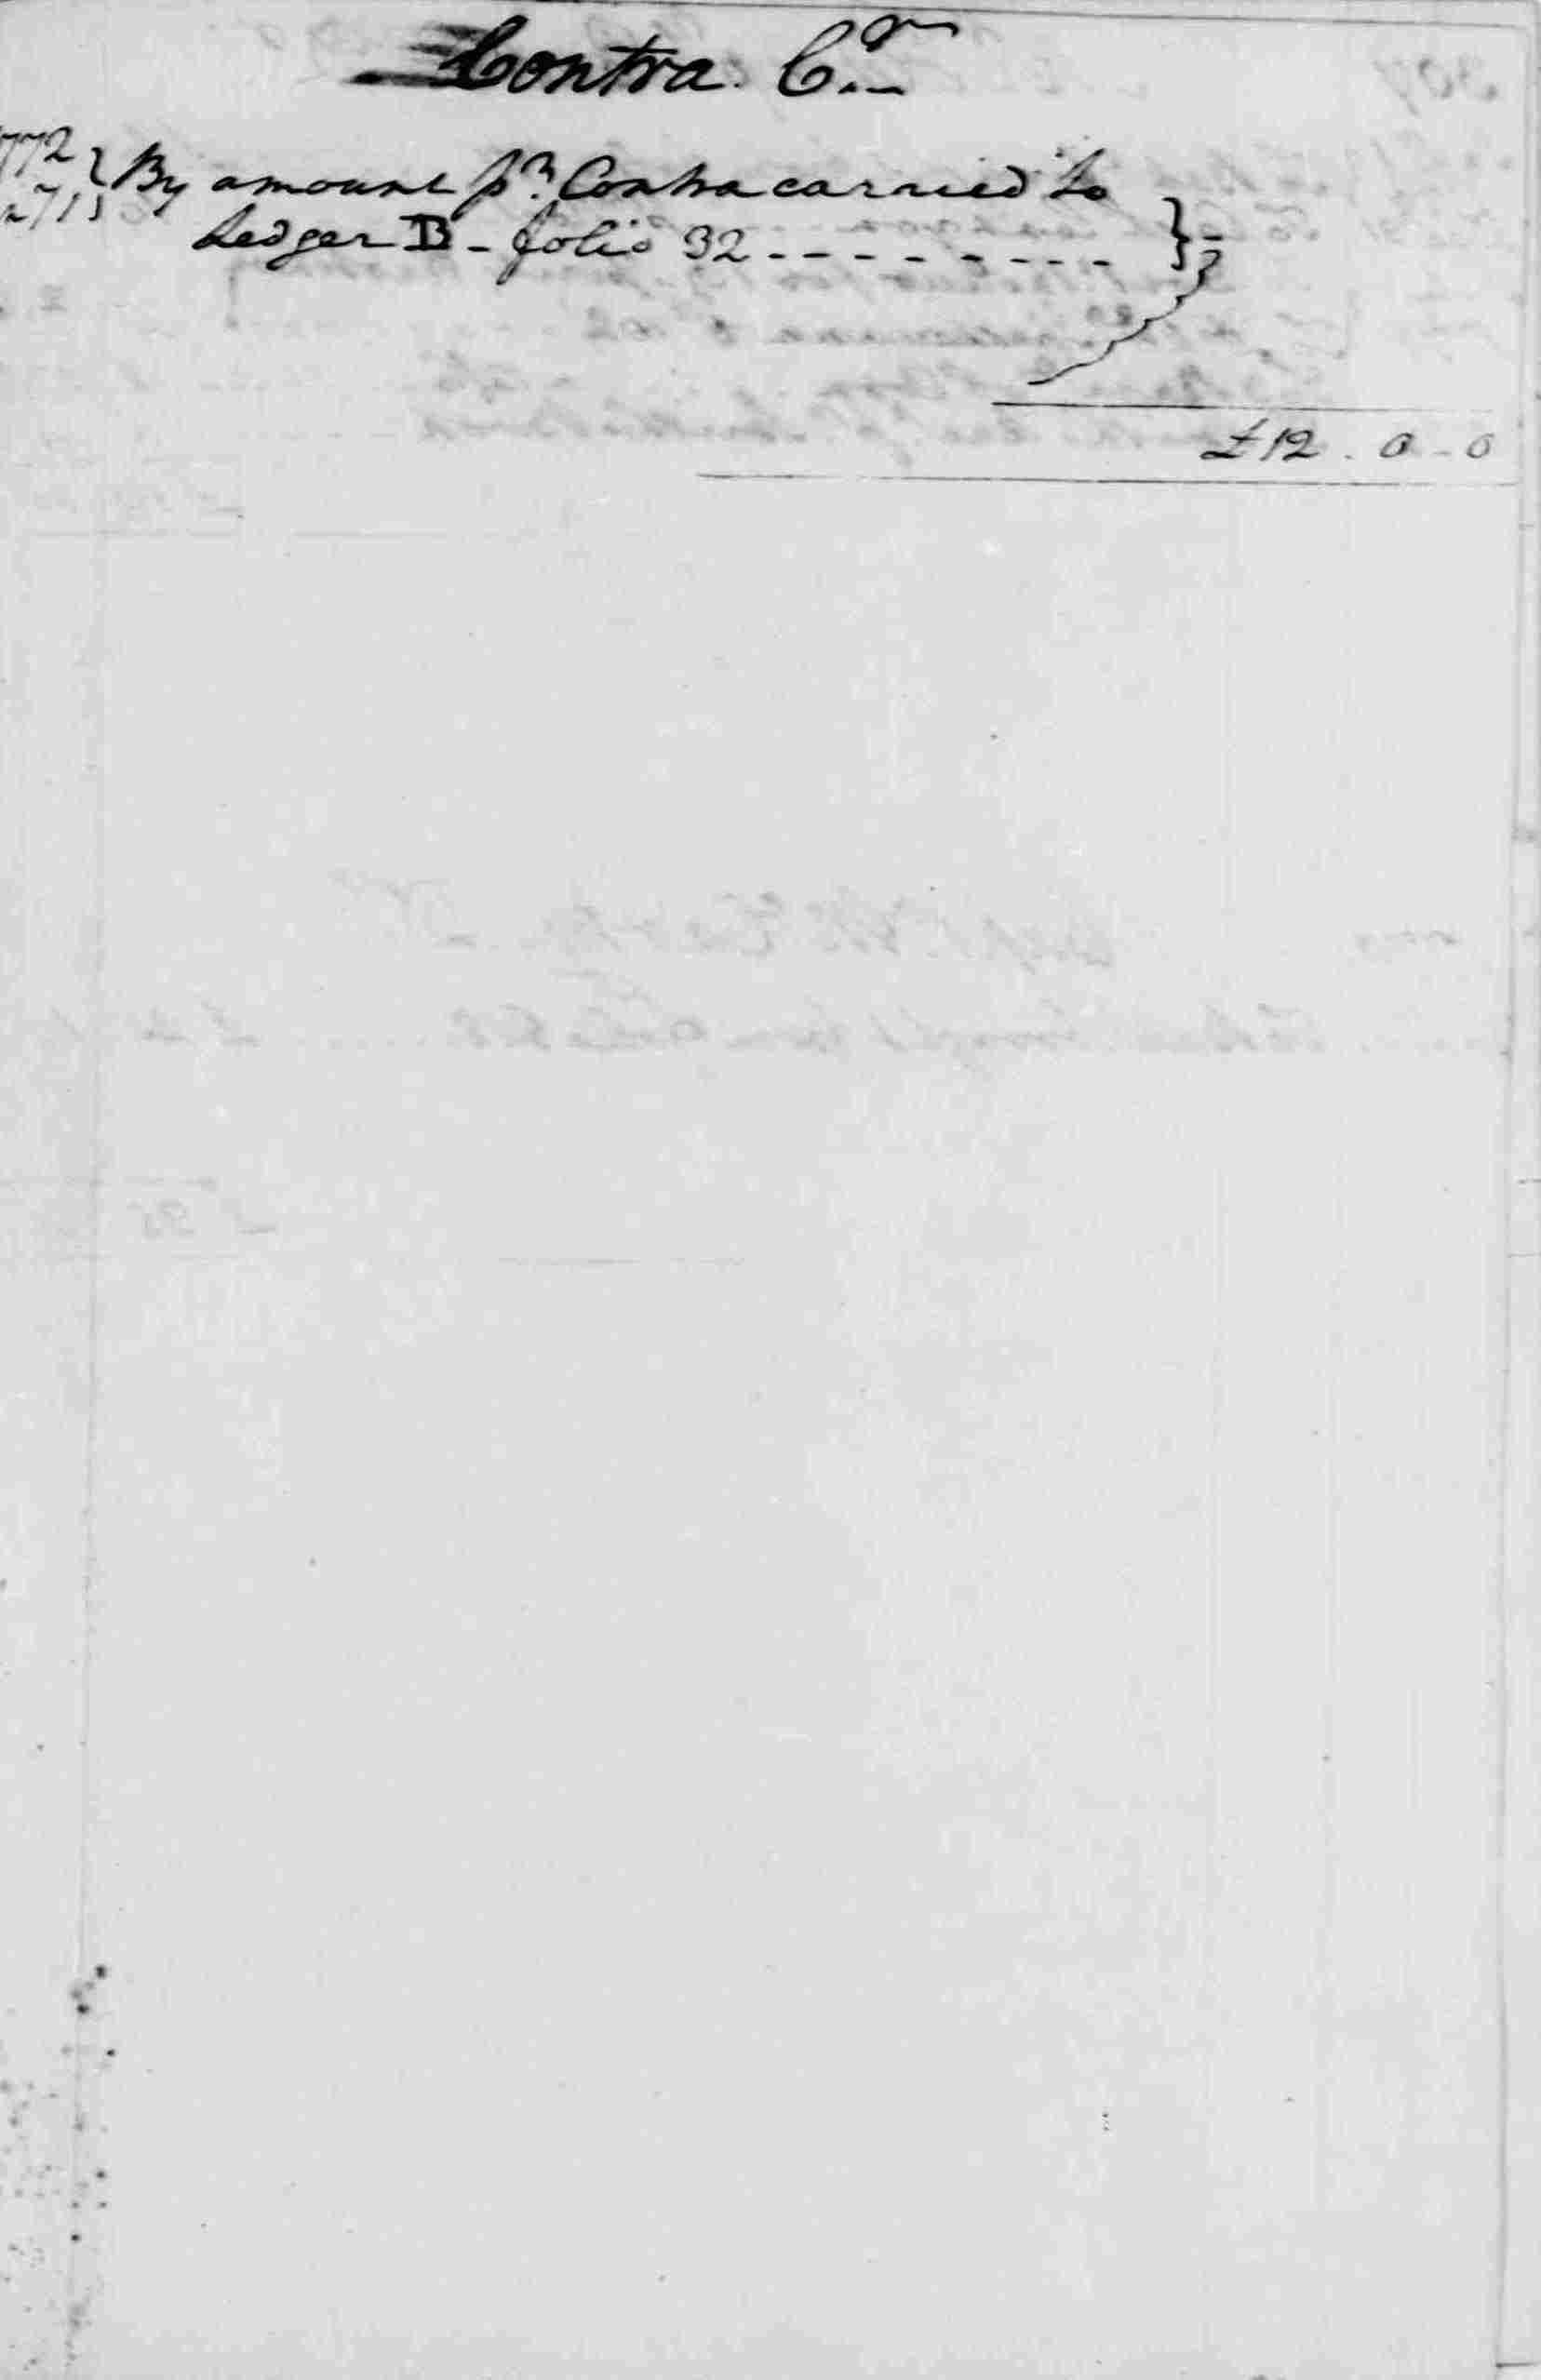 Ledger A, folio 306, right side